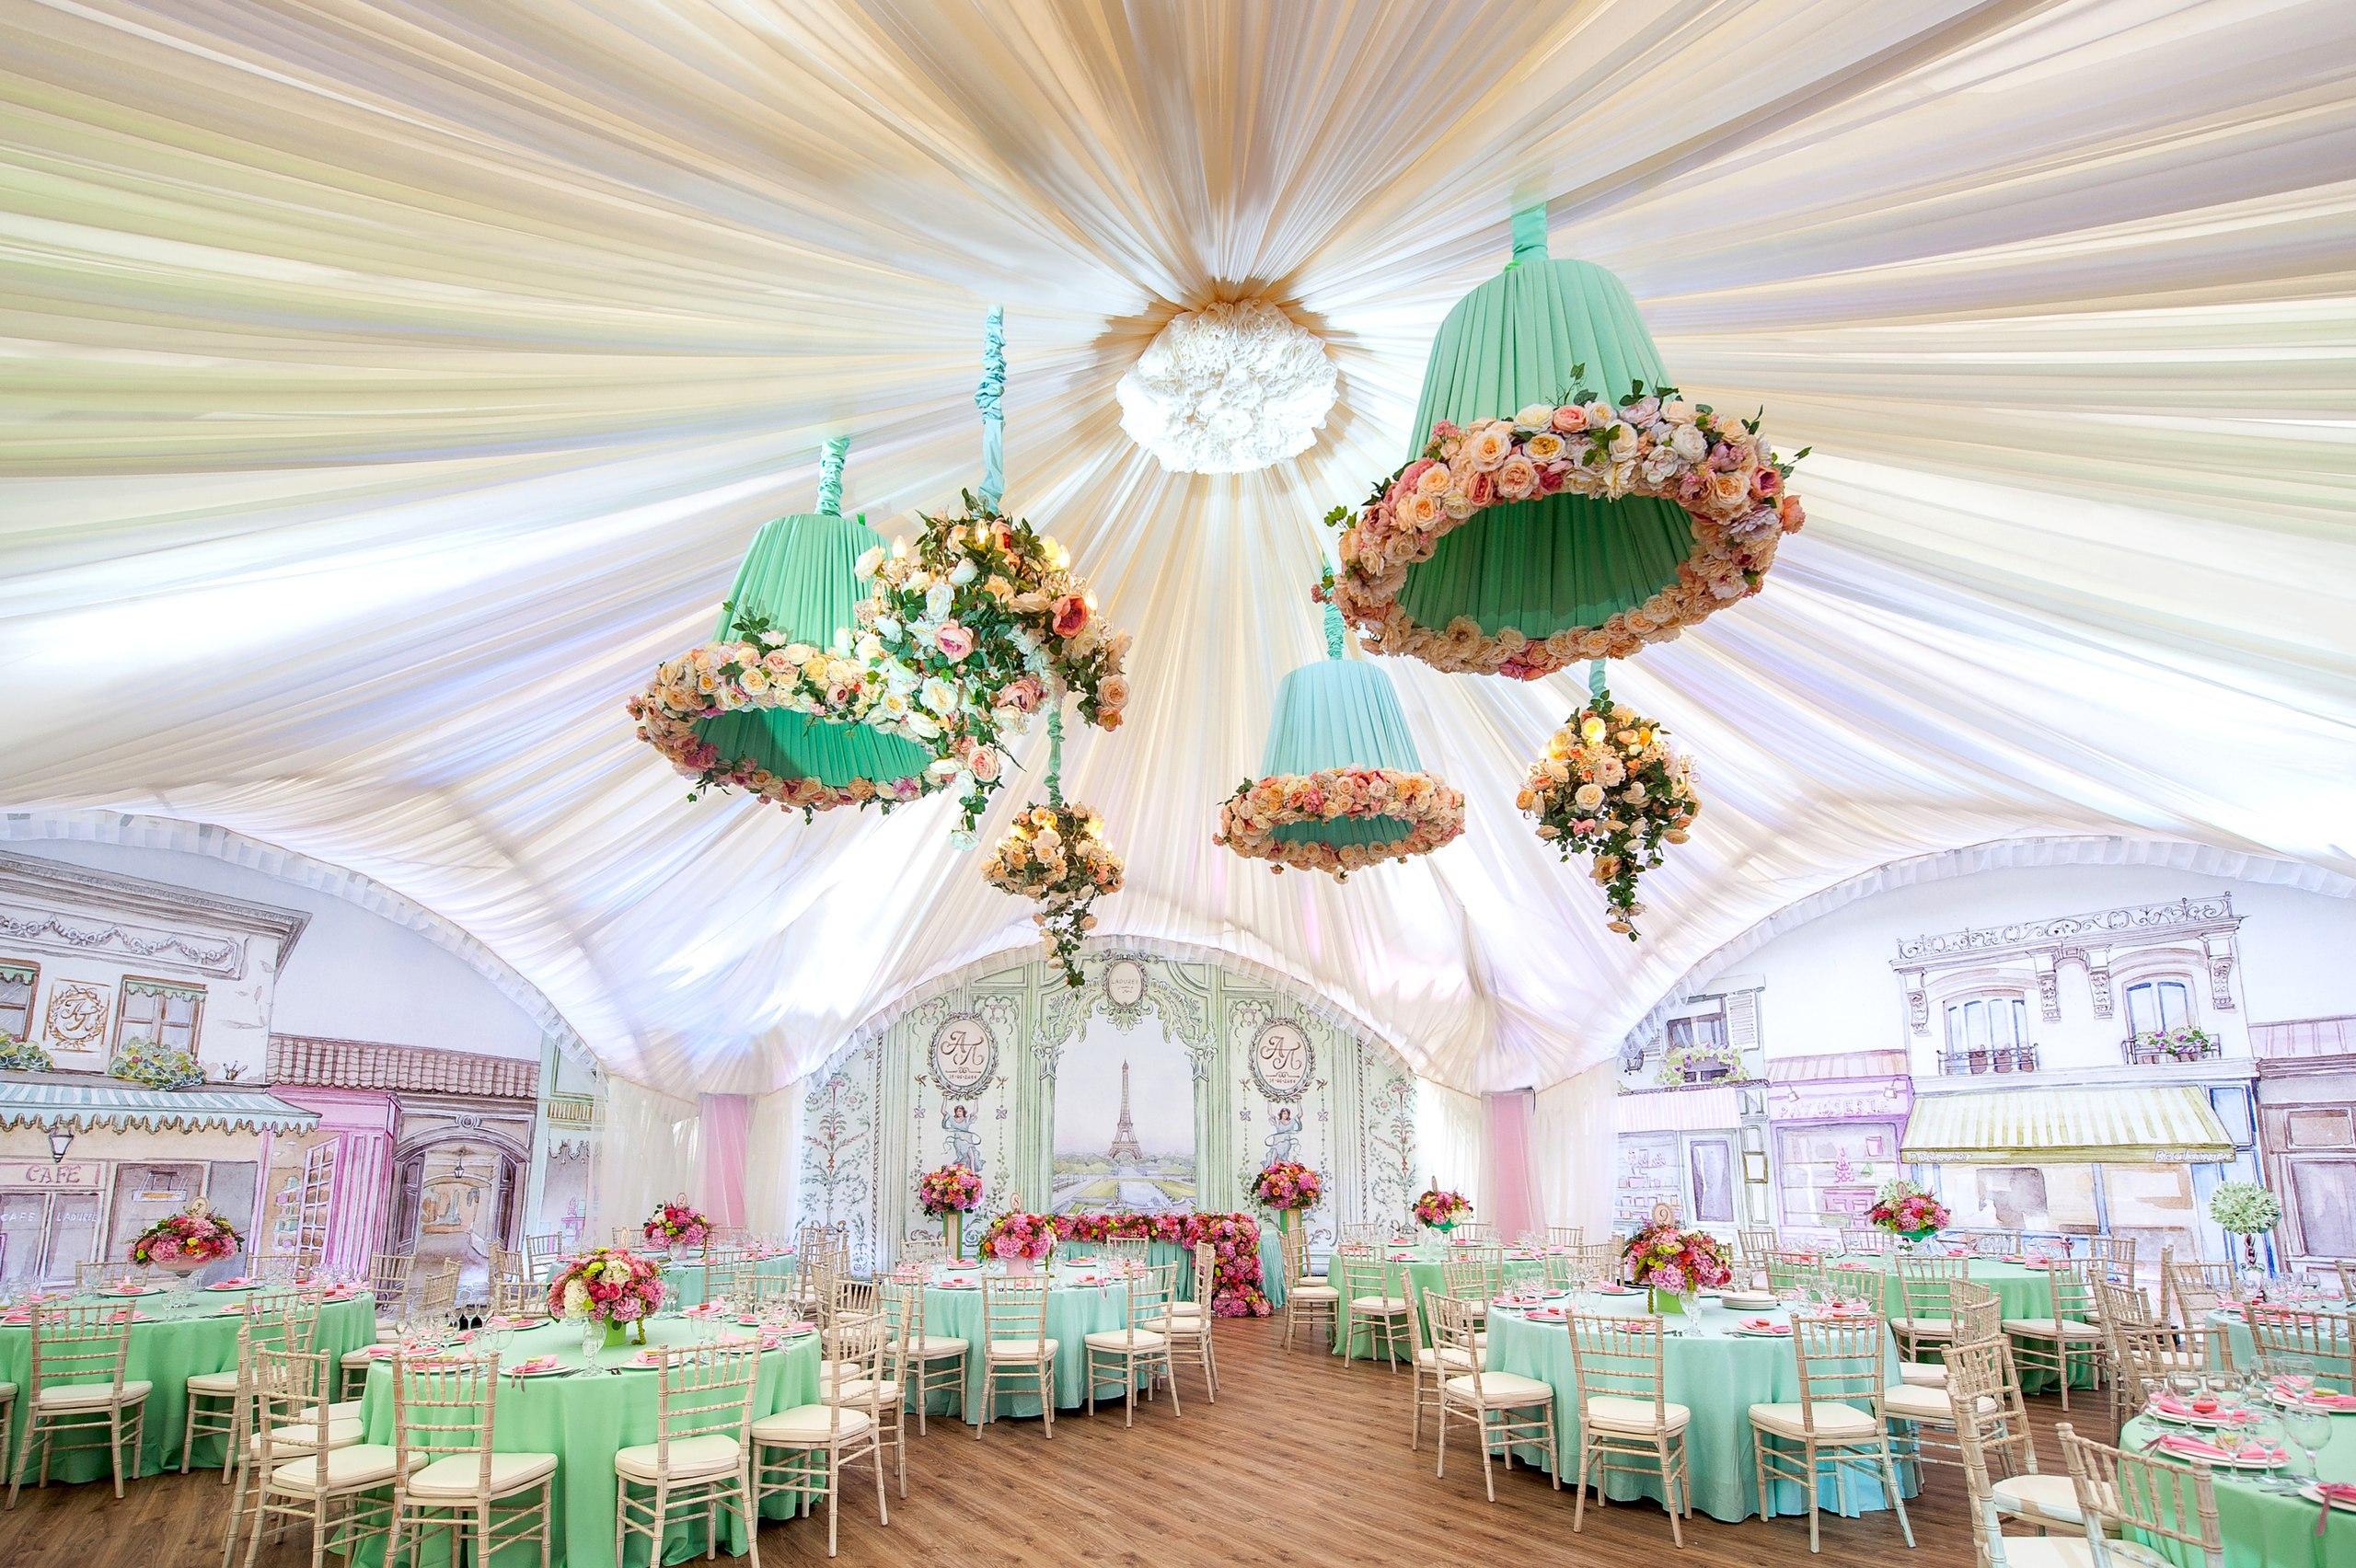 KNHU2x2MGaY - Правила декорирования столов на свадьбе